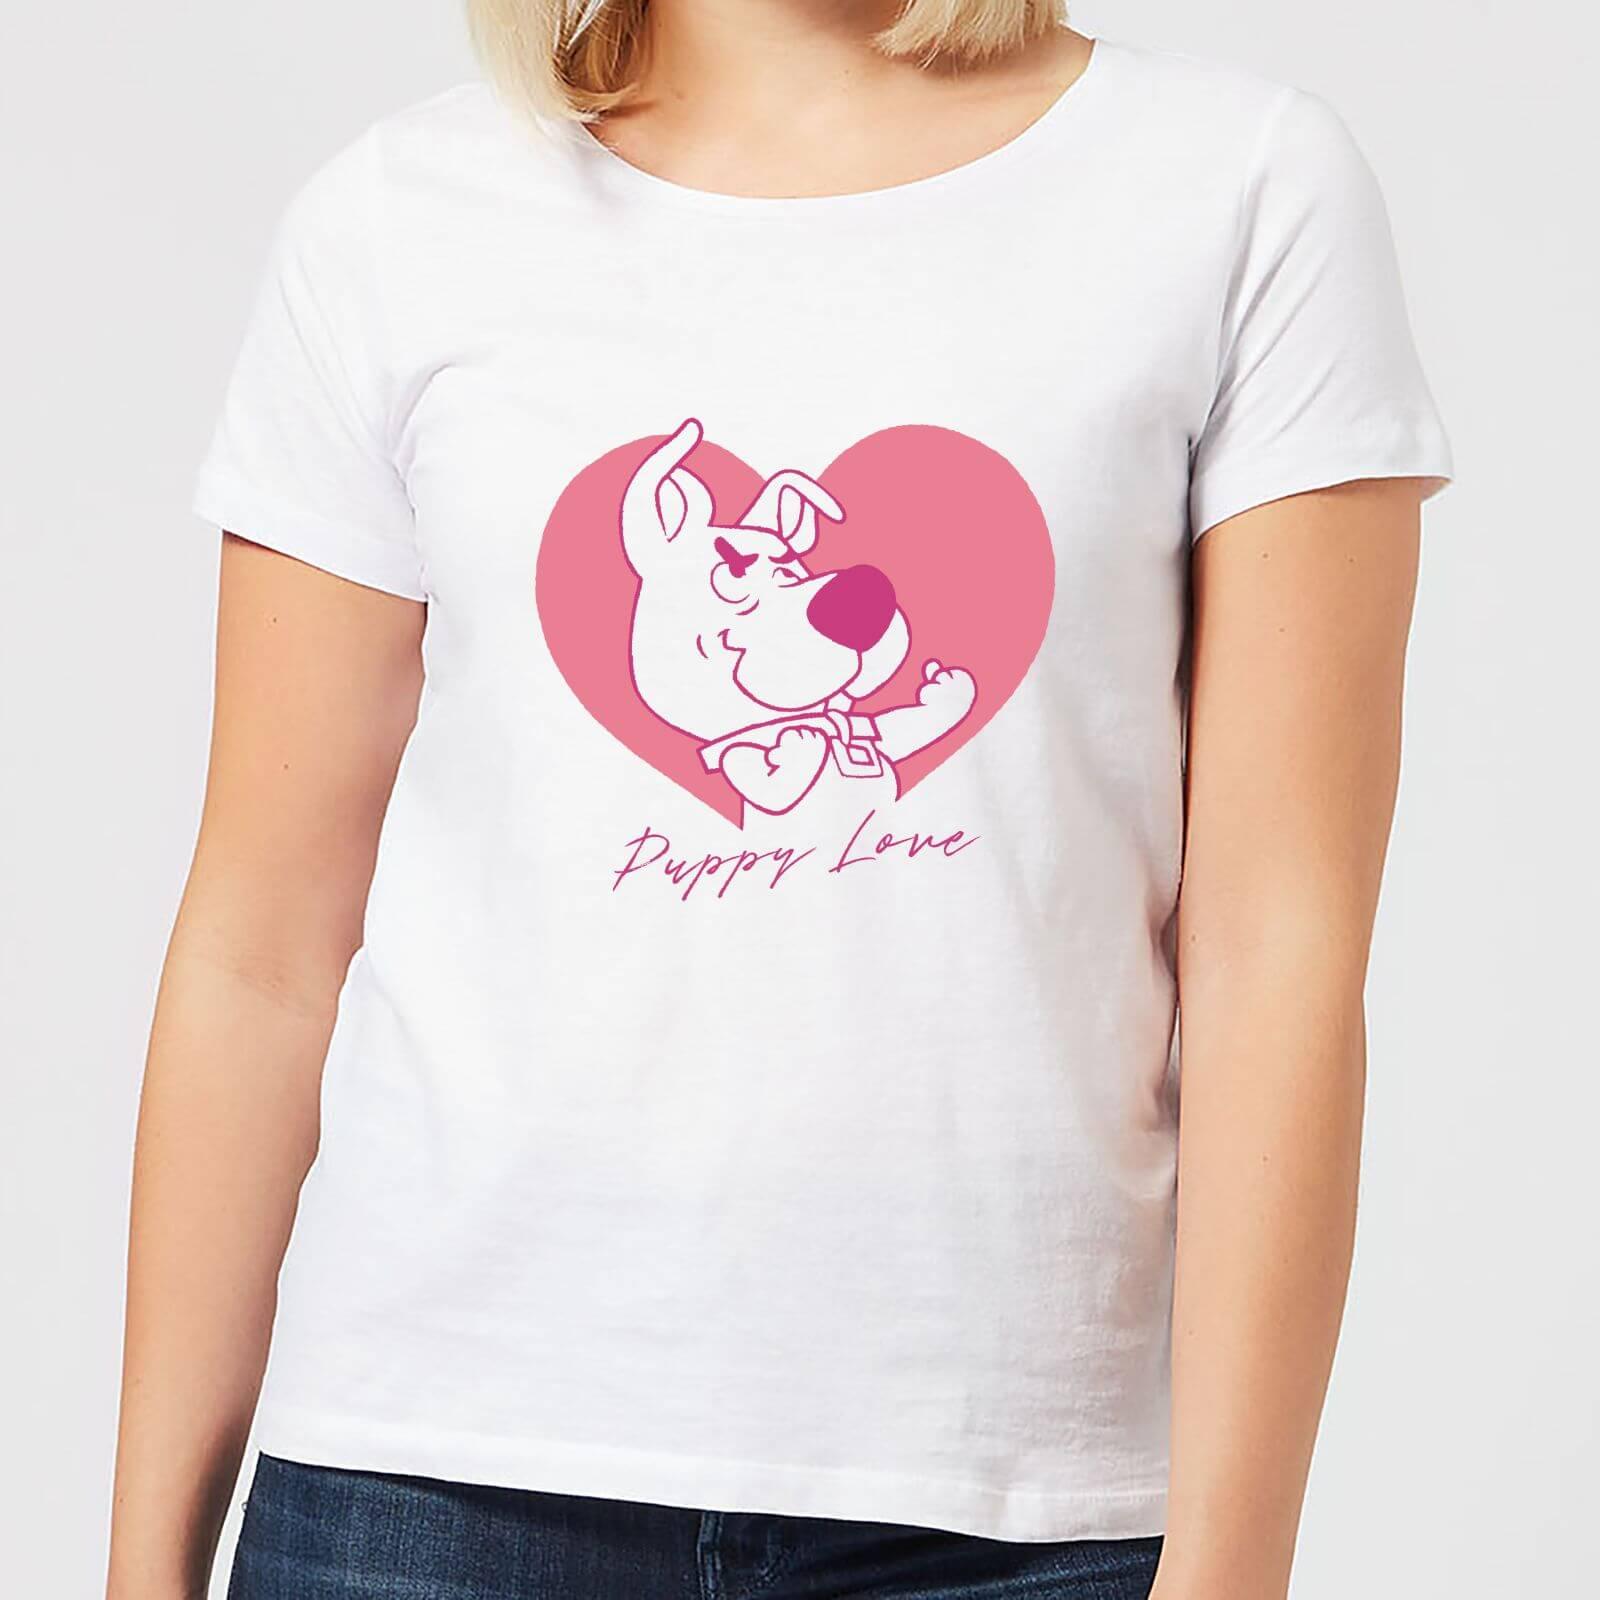 Scooby Doo Puppy Love Women's T-Shirt - White - L - White